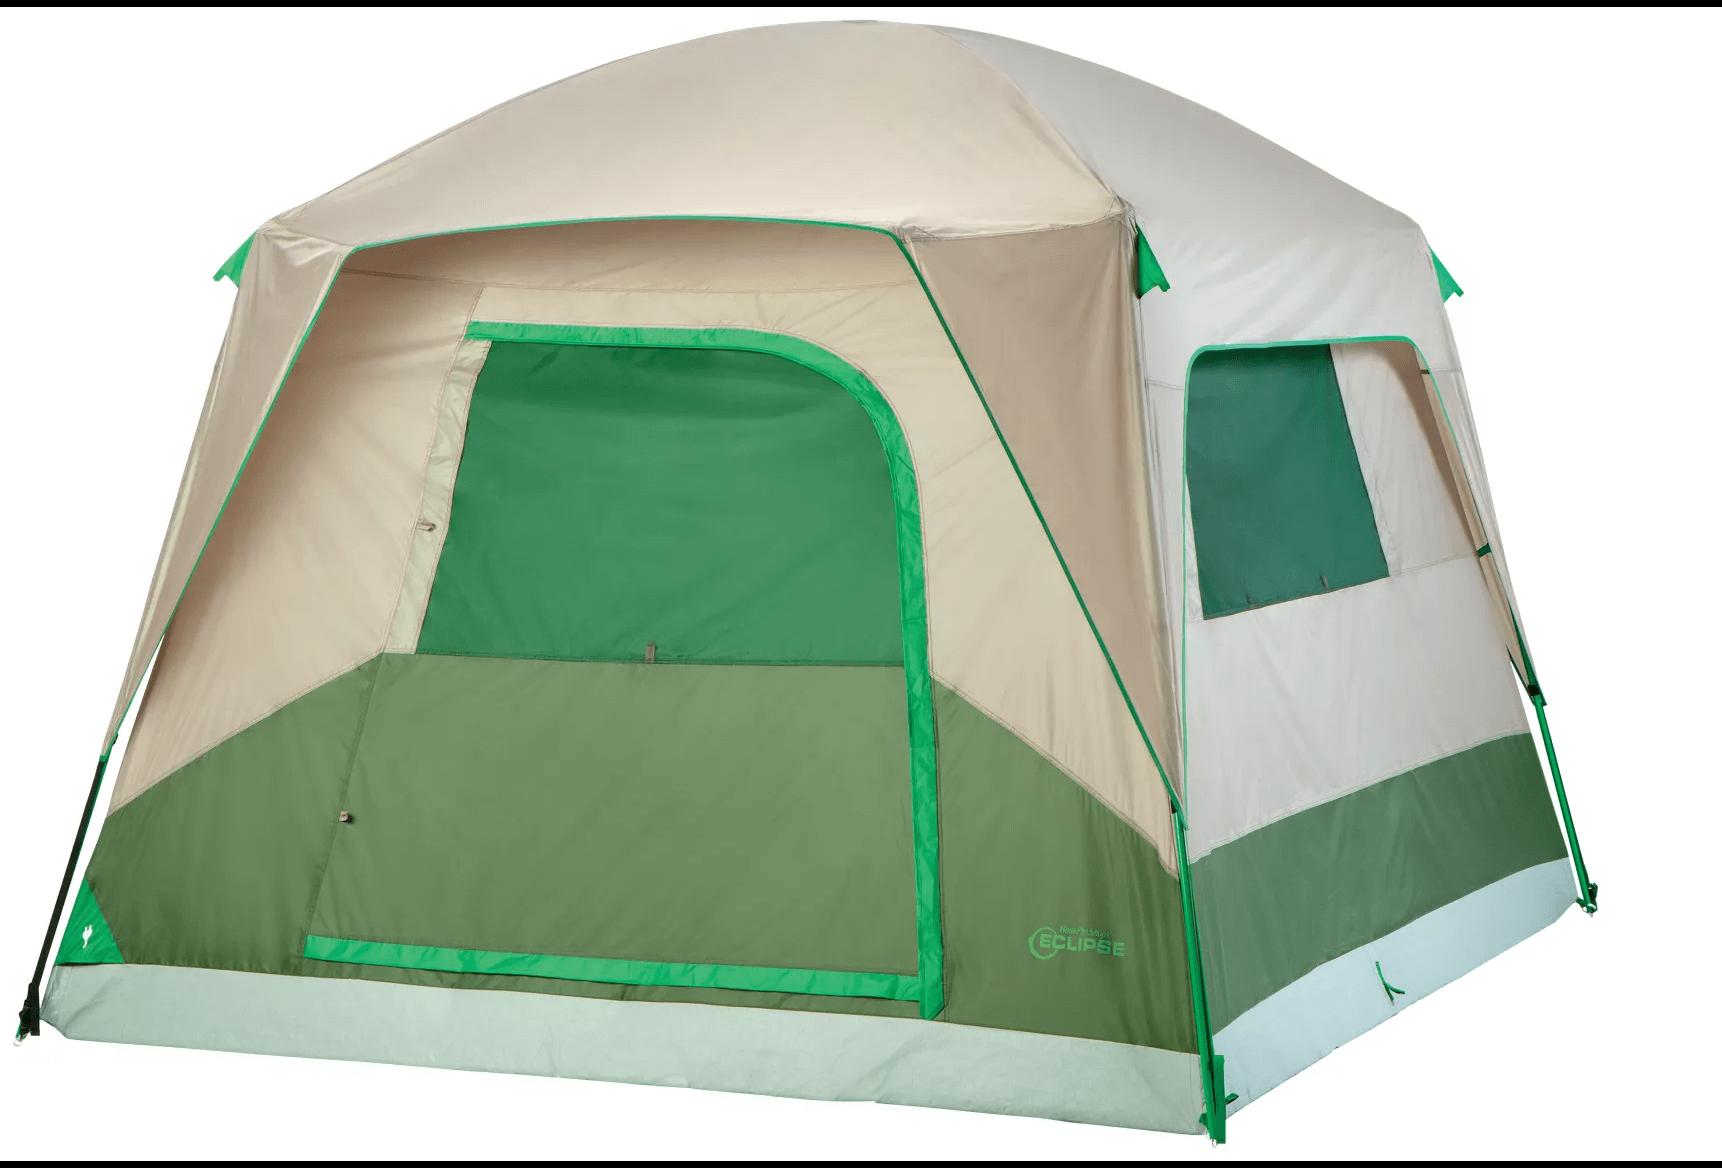 Bass Pro Shops Eclipse 6-Person Cabin Tent